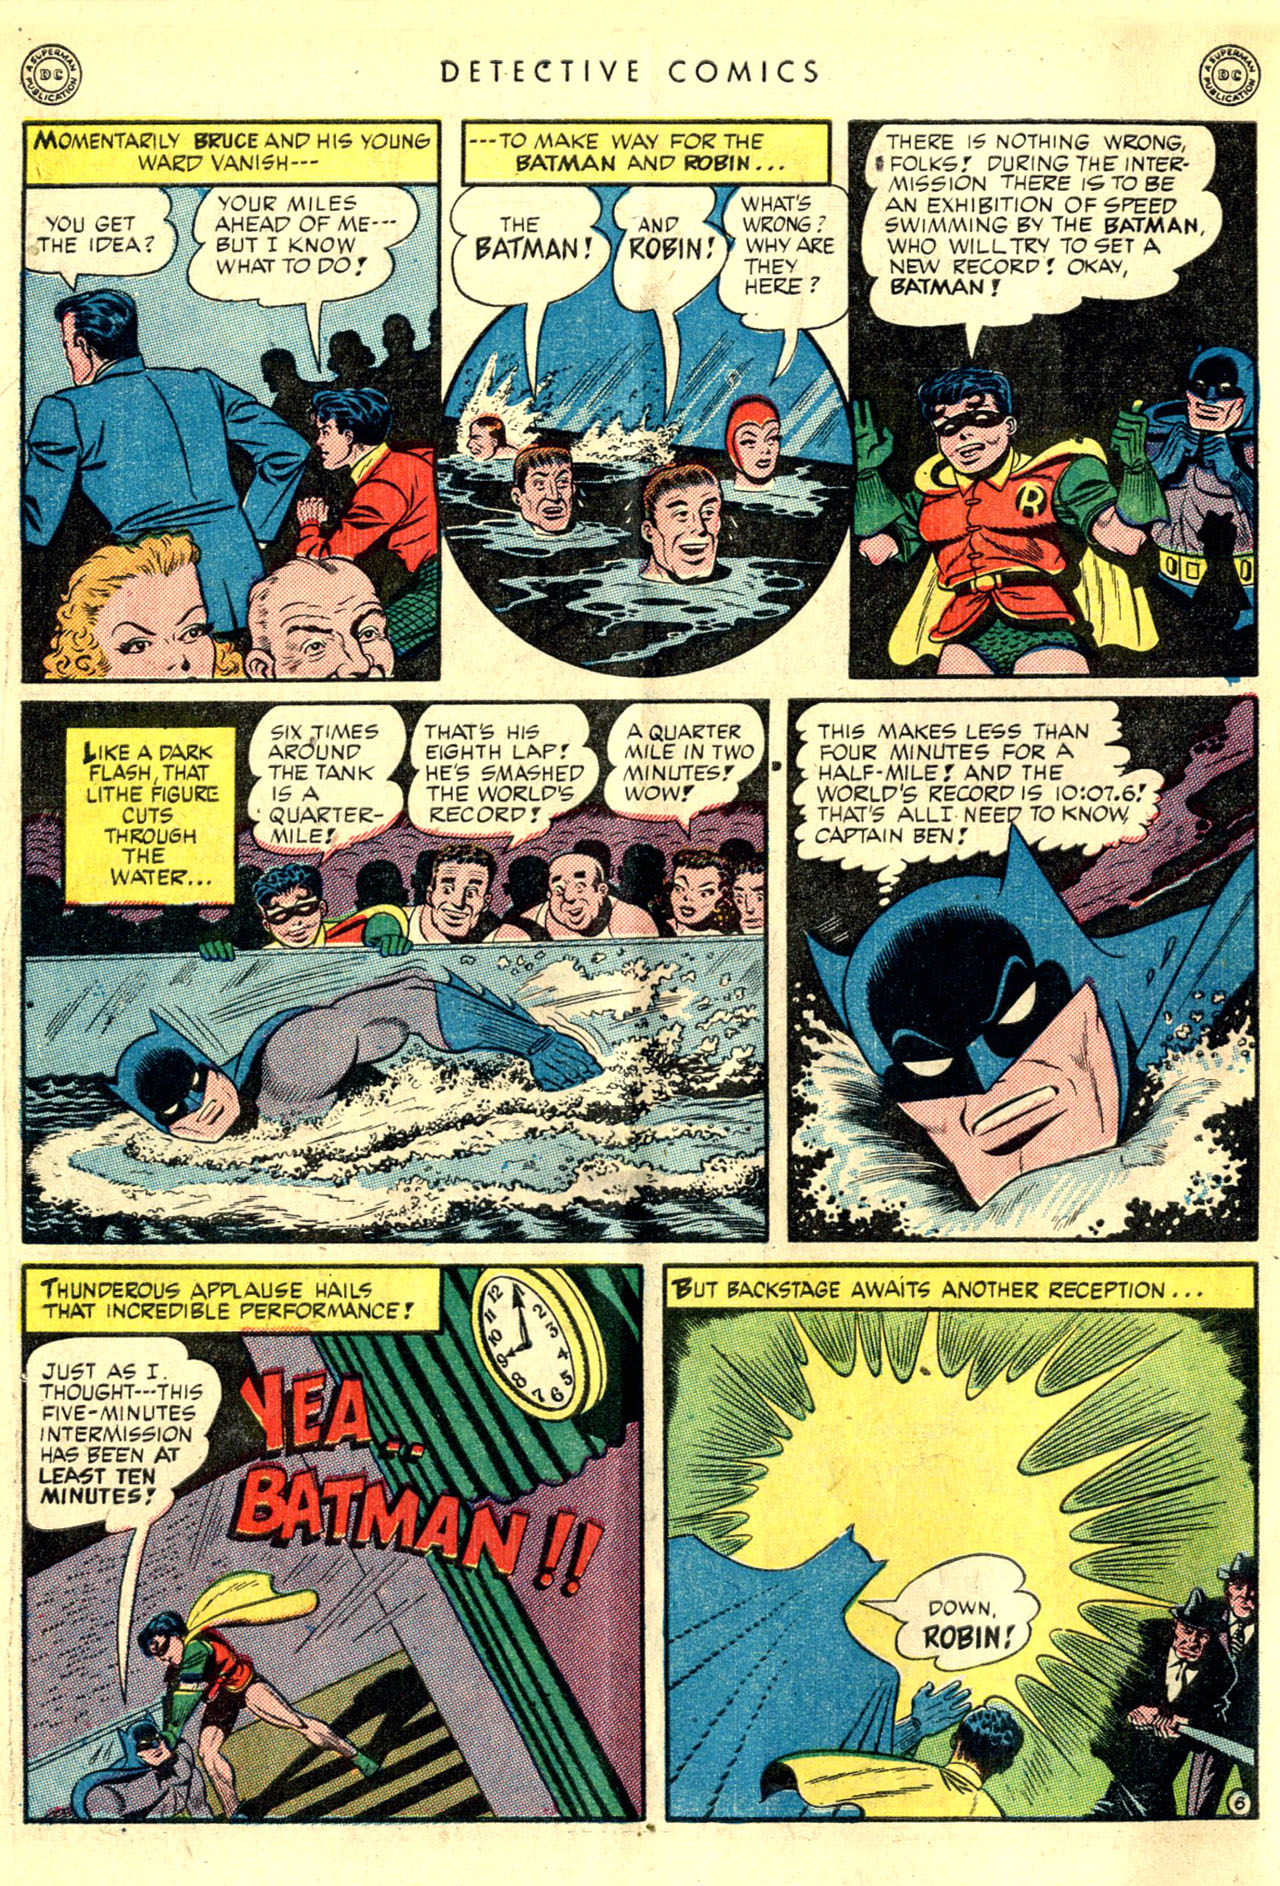 Read online Detective Comics (1937) comic -  Issue #90 - 8